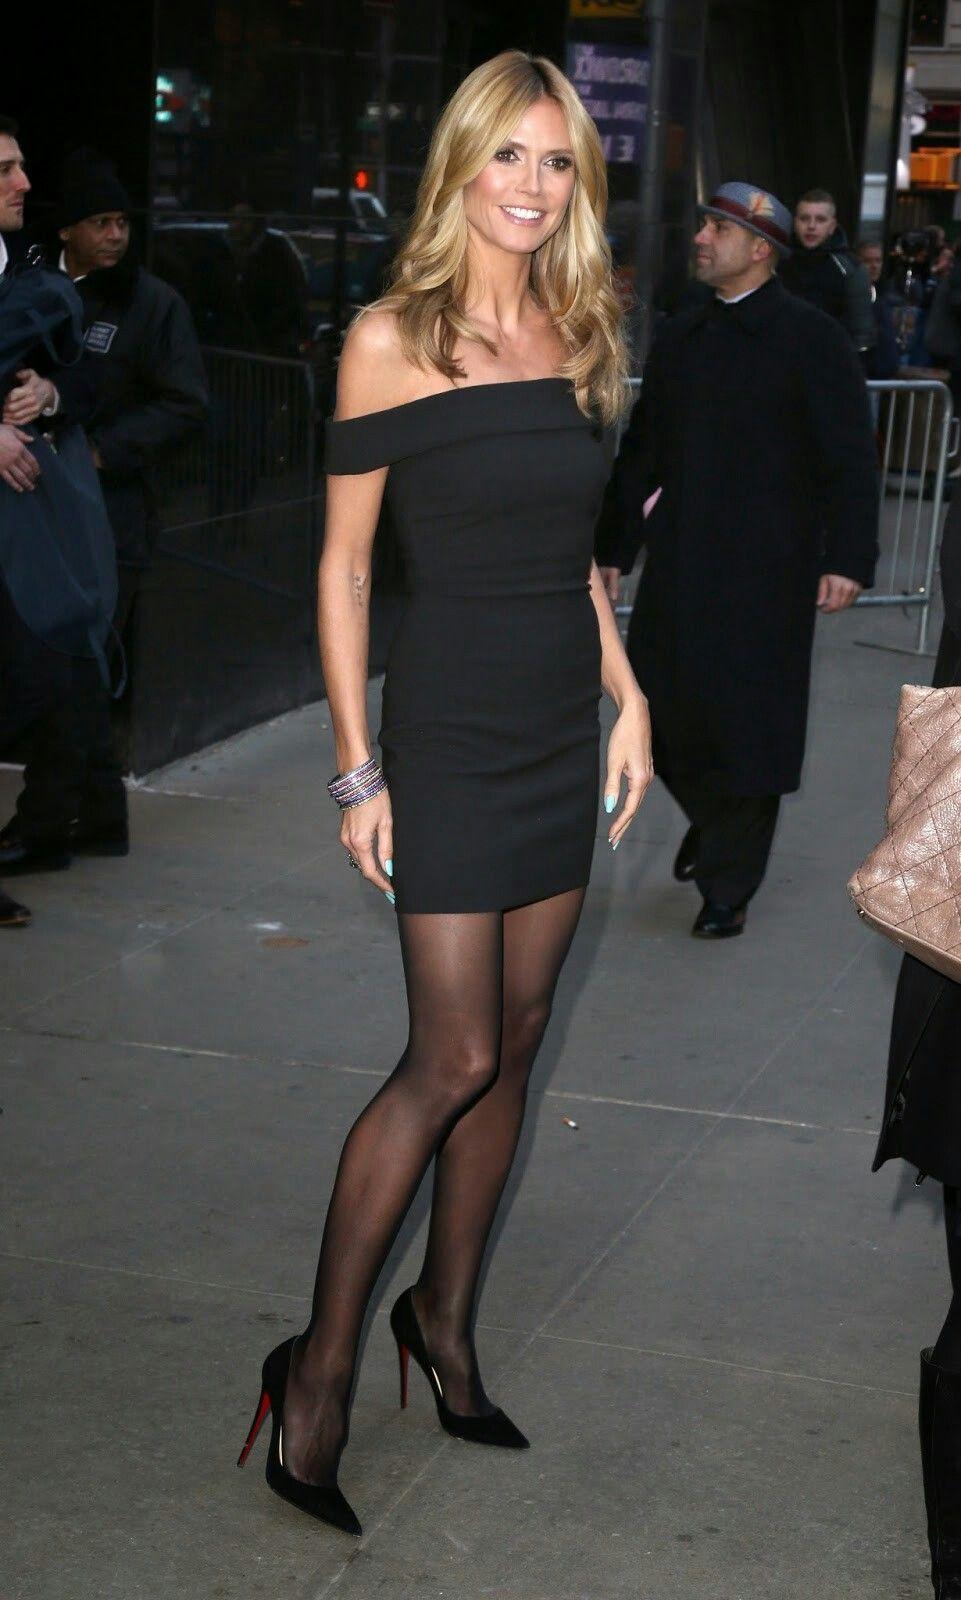 05ceee414b1 Heidi Klum leggy in an off the shoulder little black dress and Louboutin  pumps